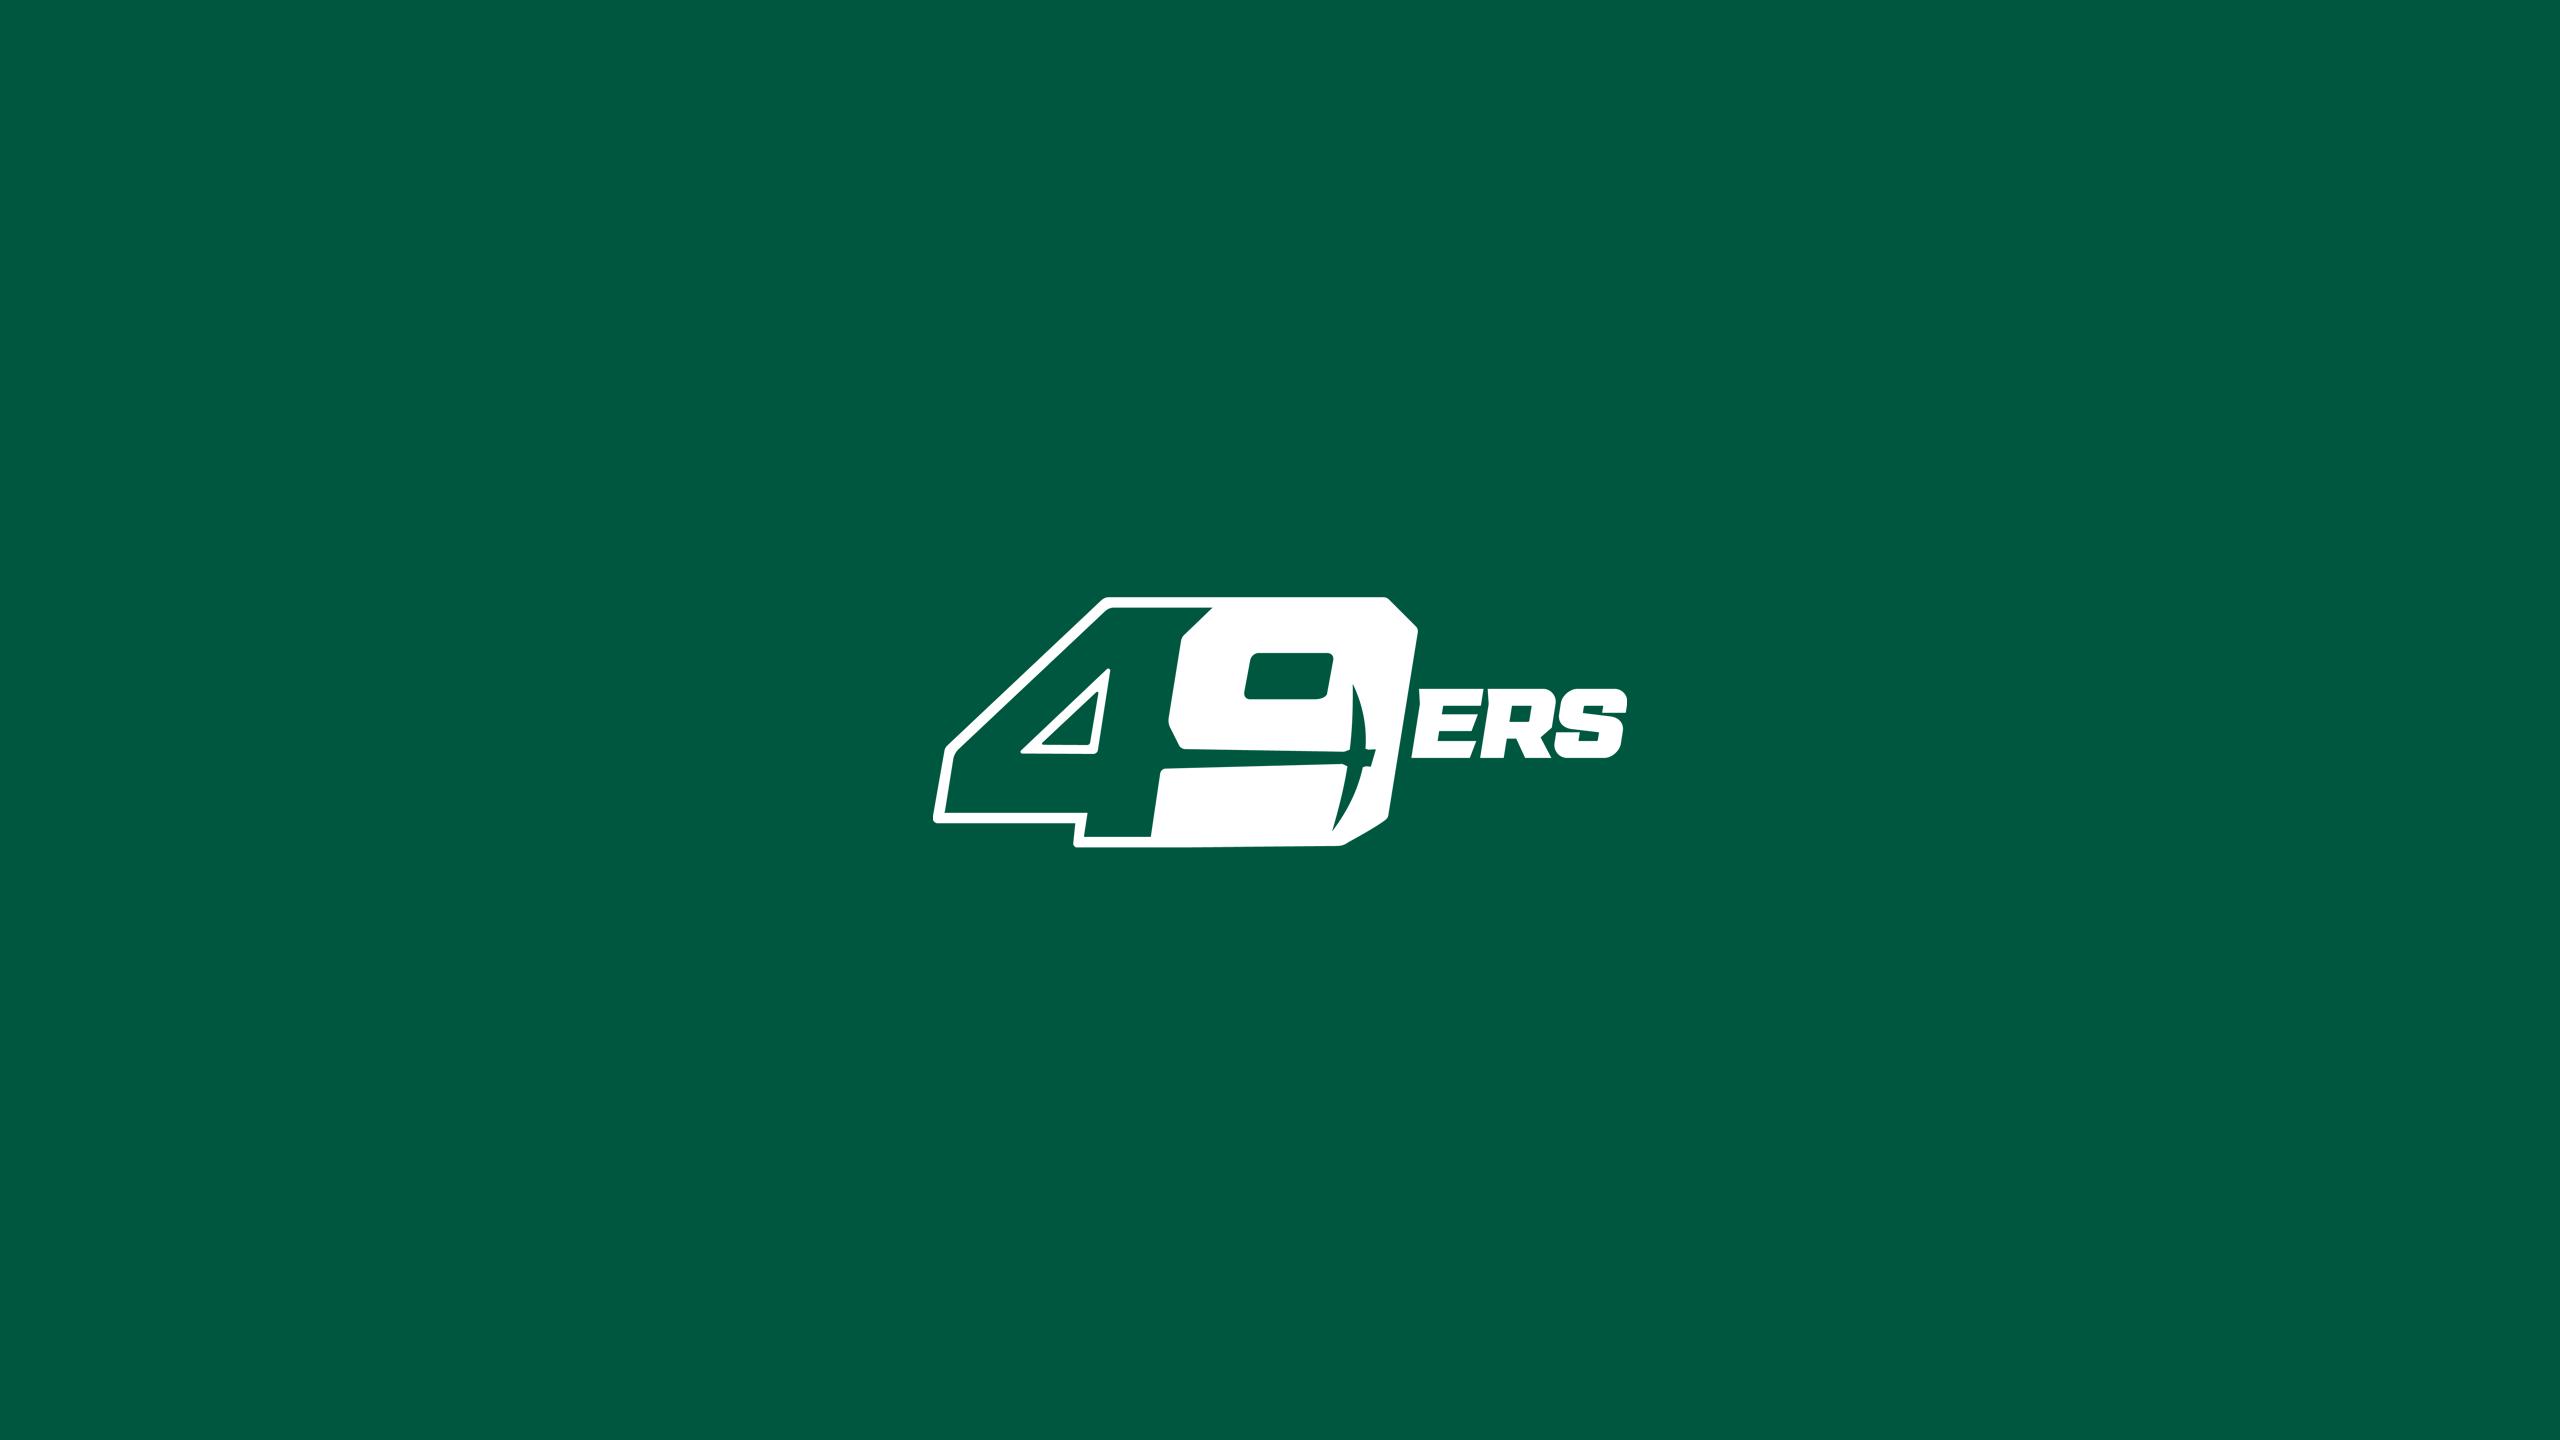 UNC-Charlotte 49ers